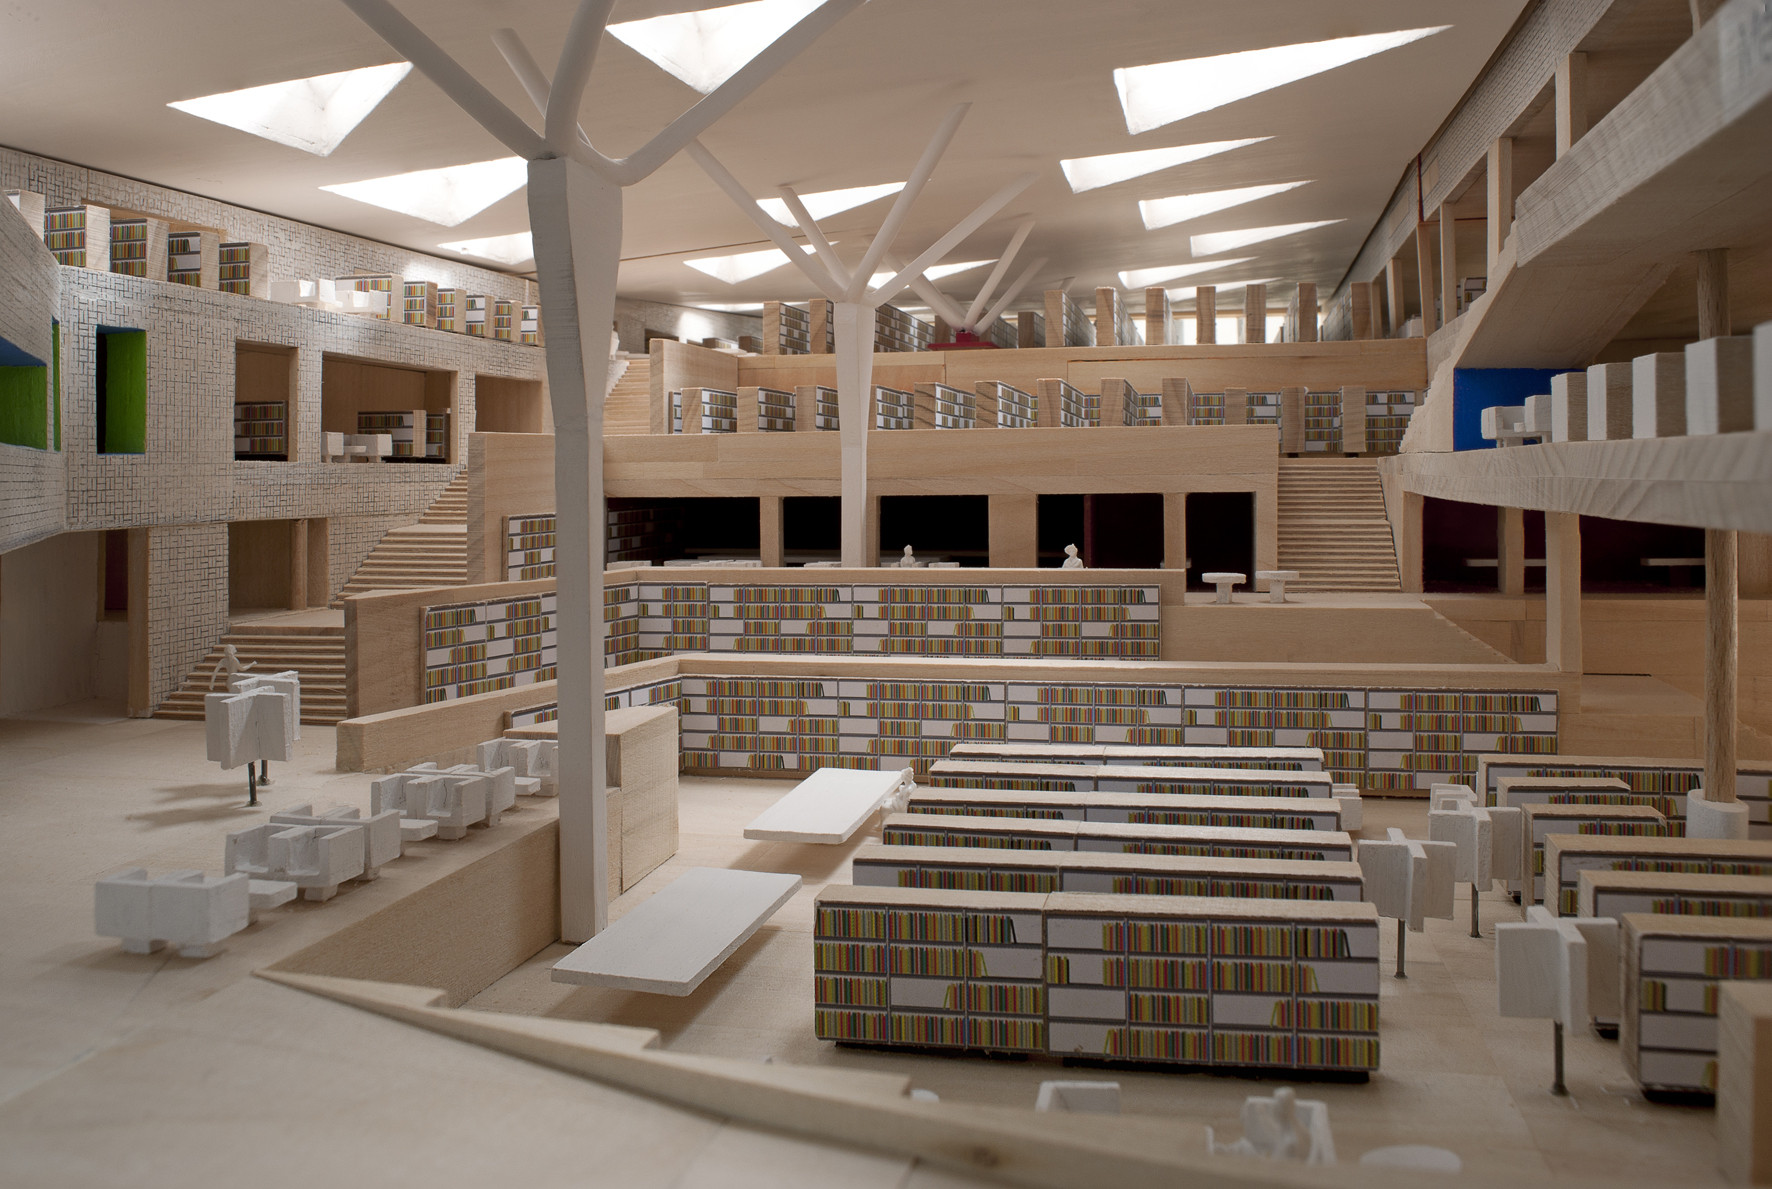 BNL Bibliothèque Nationale De Luxembourg / BOLLES+WILSON, Wood Model  Interior. Image ©